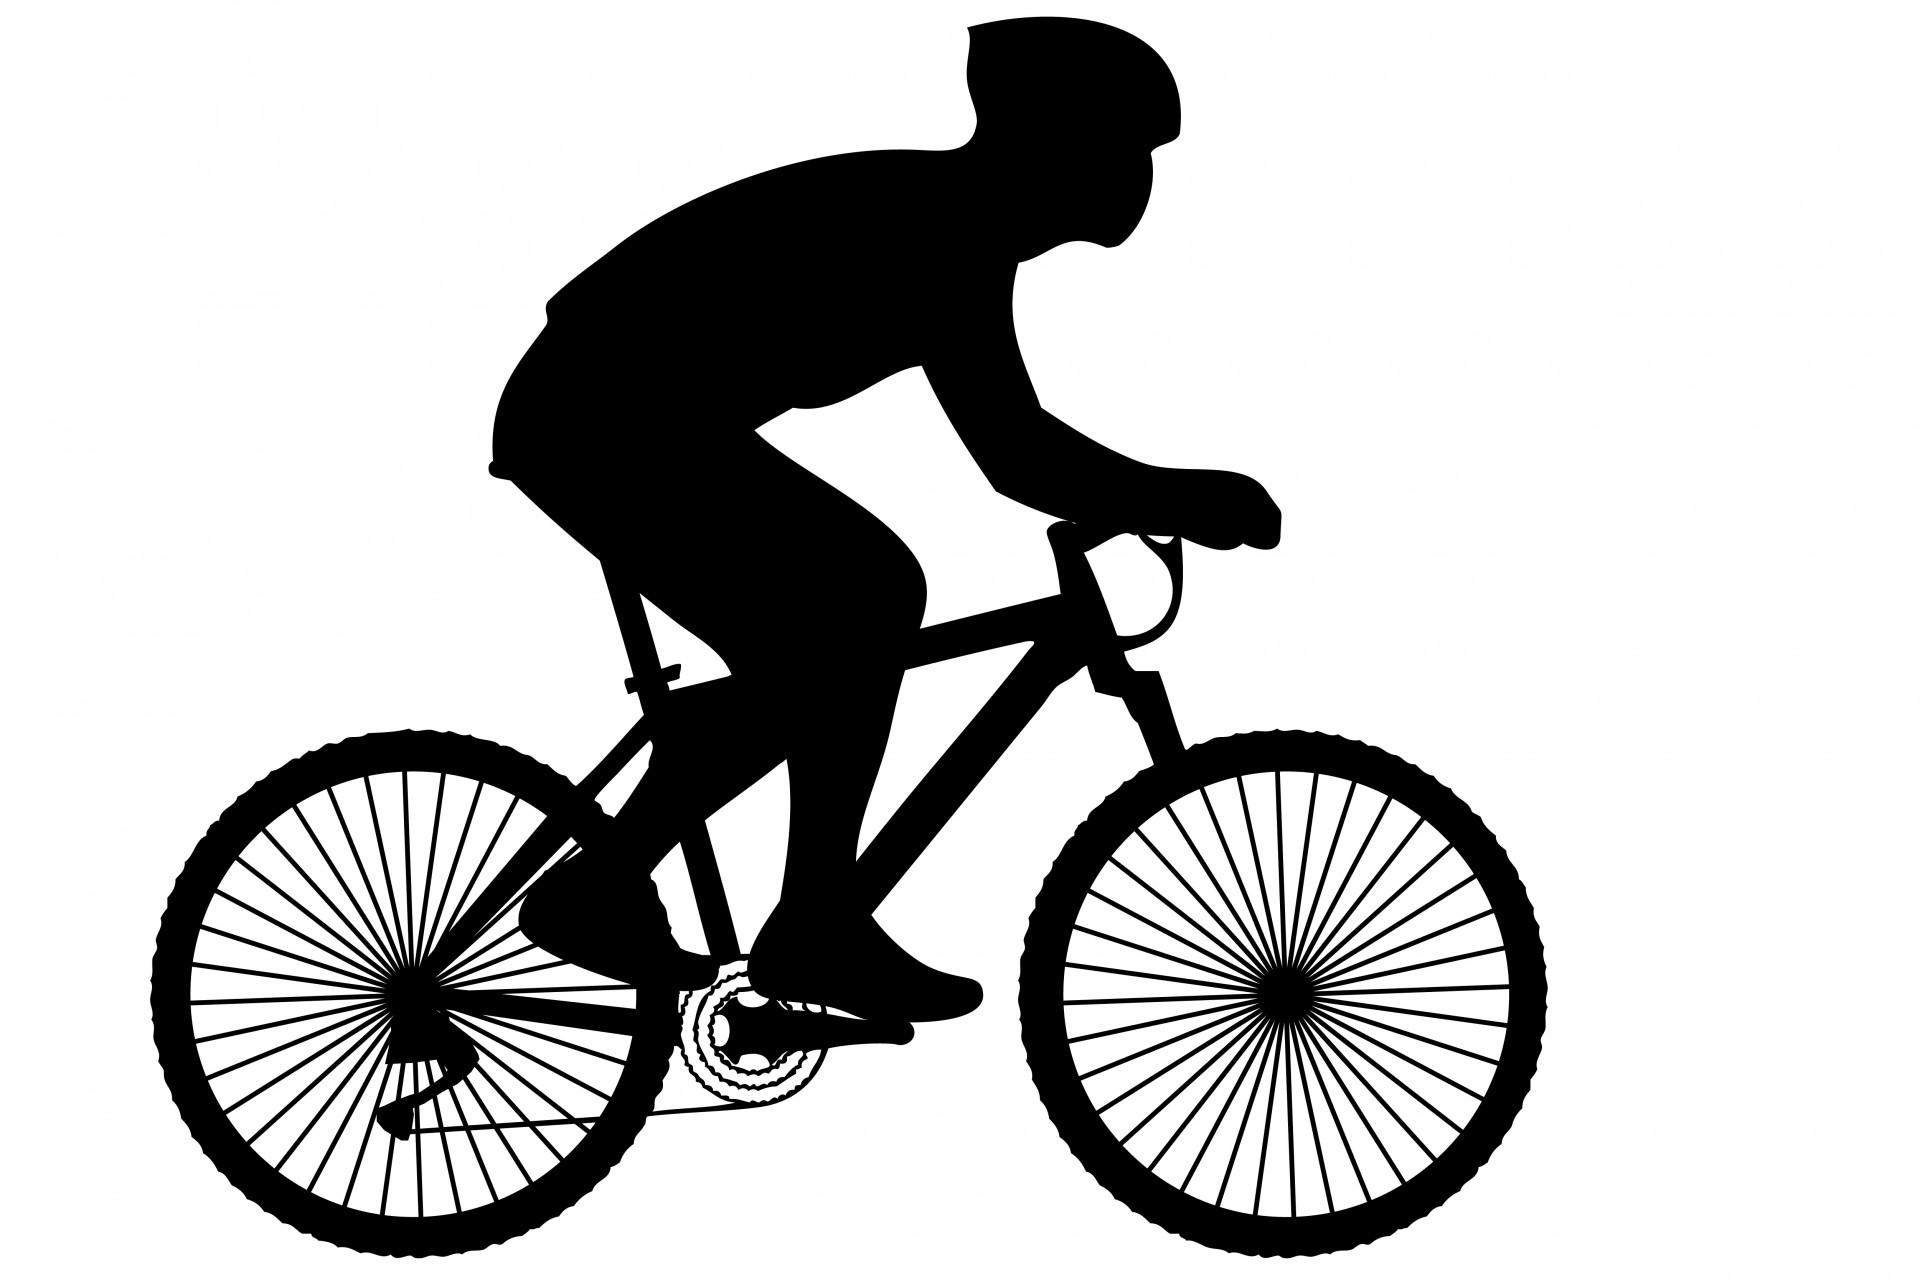 Bike clipart silhouette. Cyclist black free stock